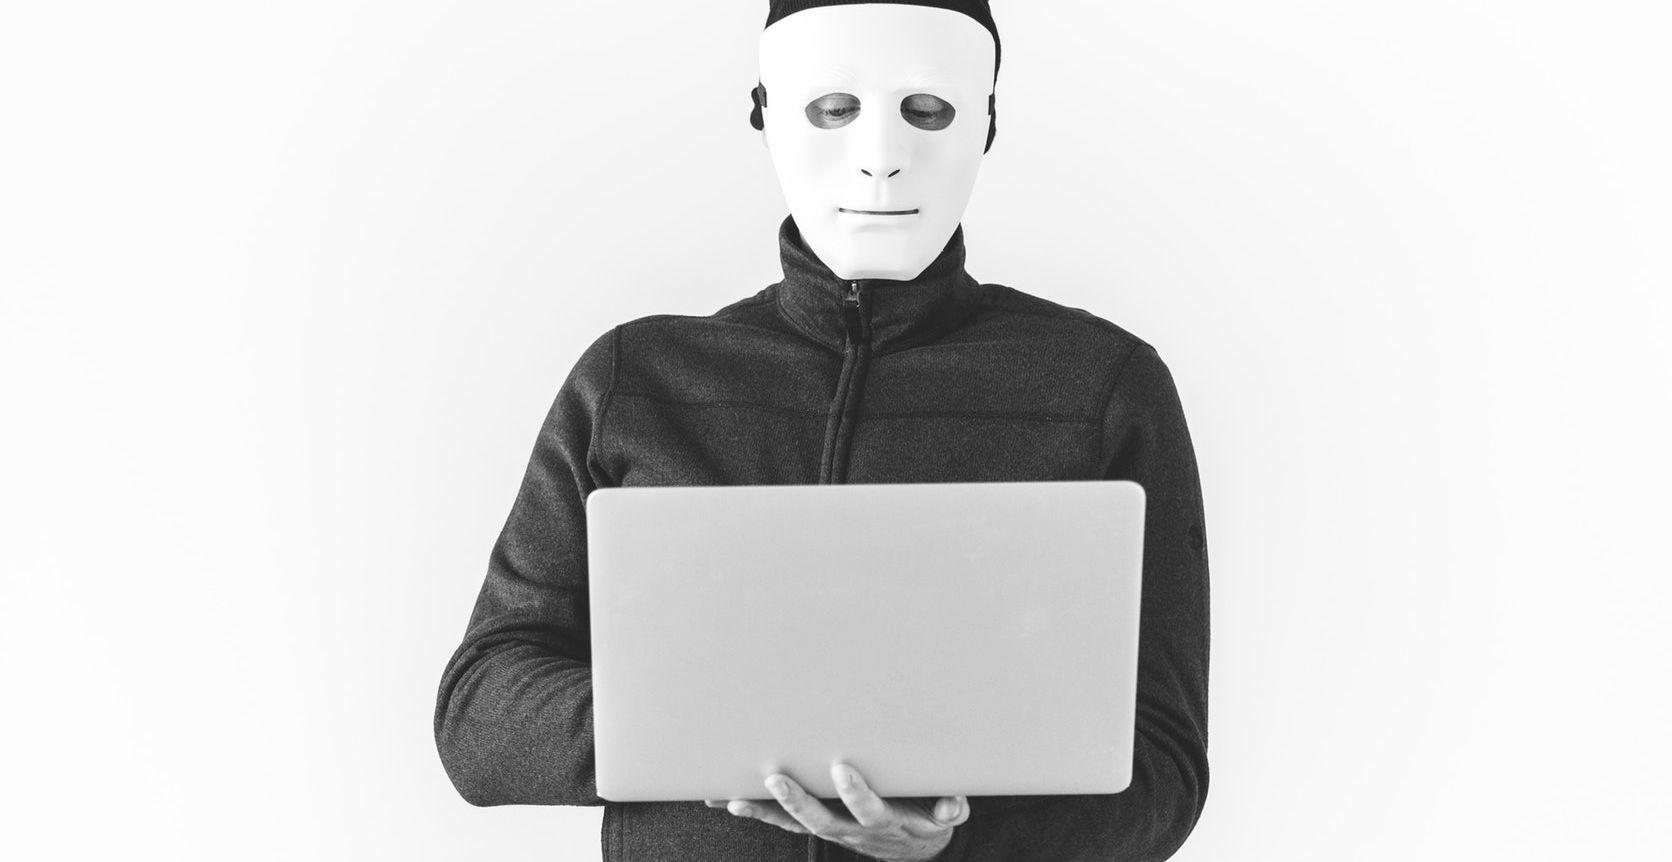 Top 10 Best Free Antivirus Software